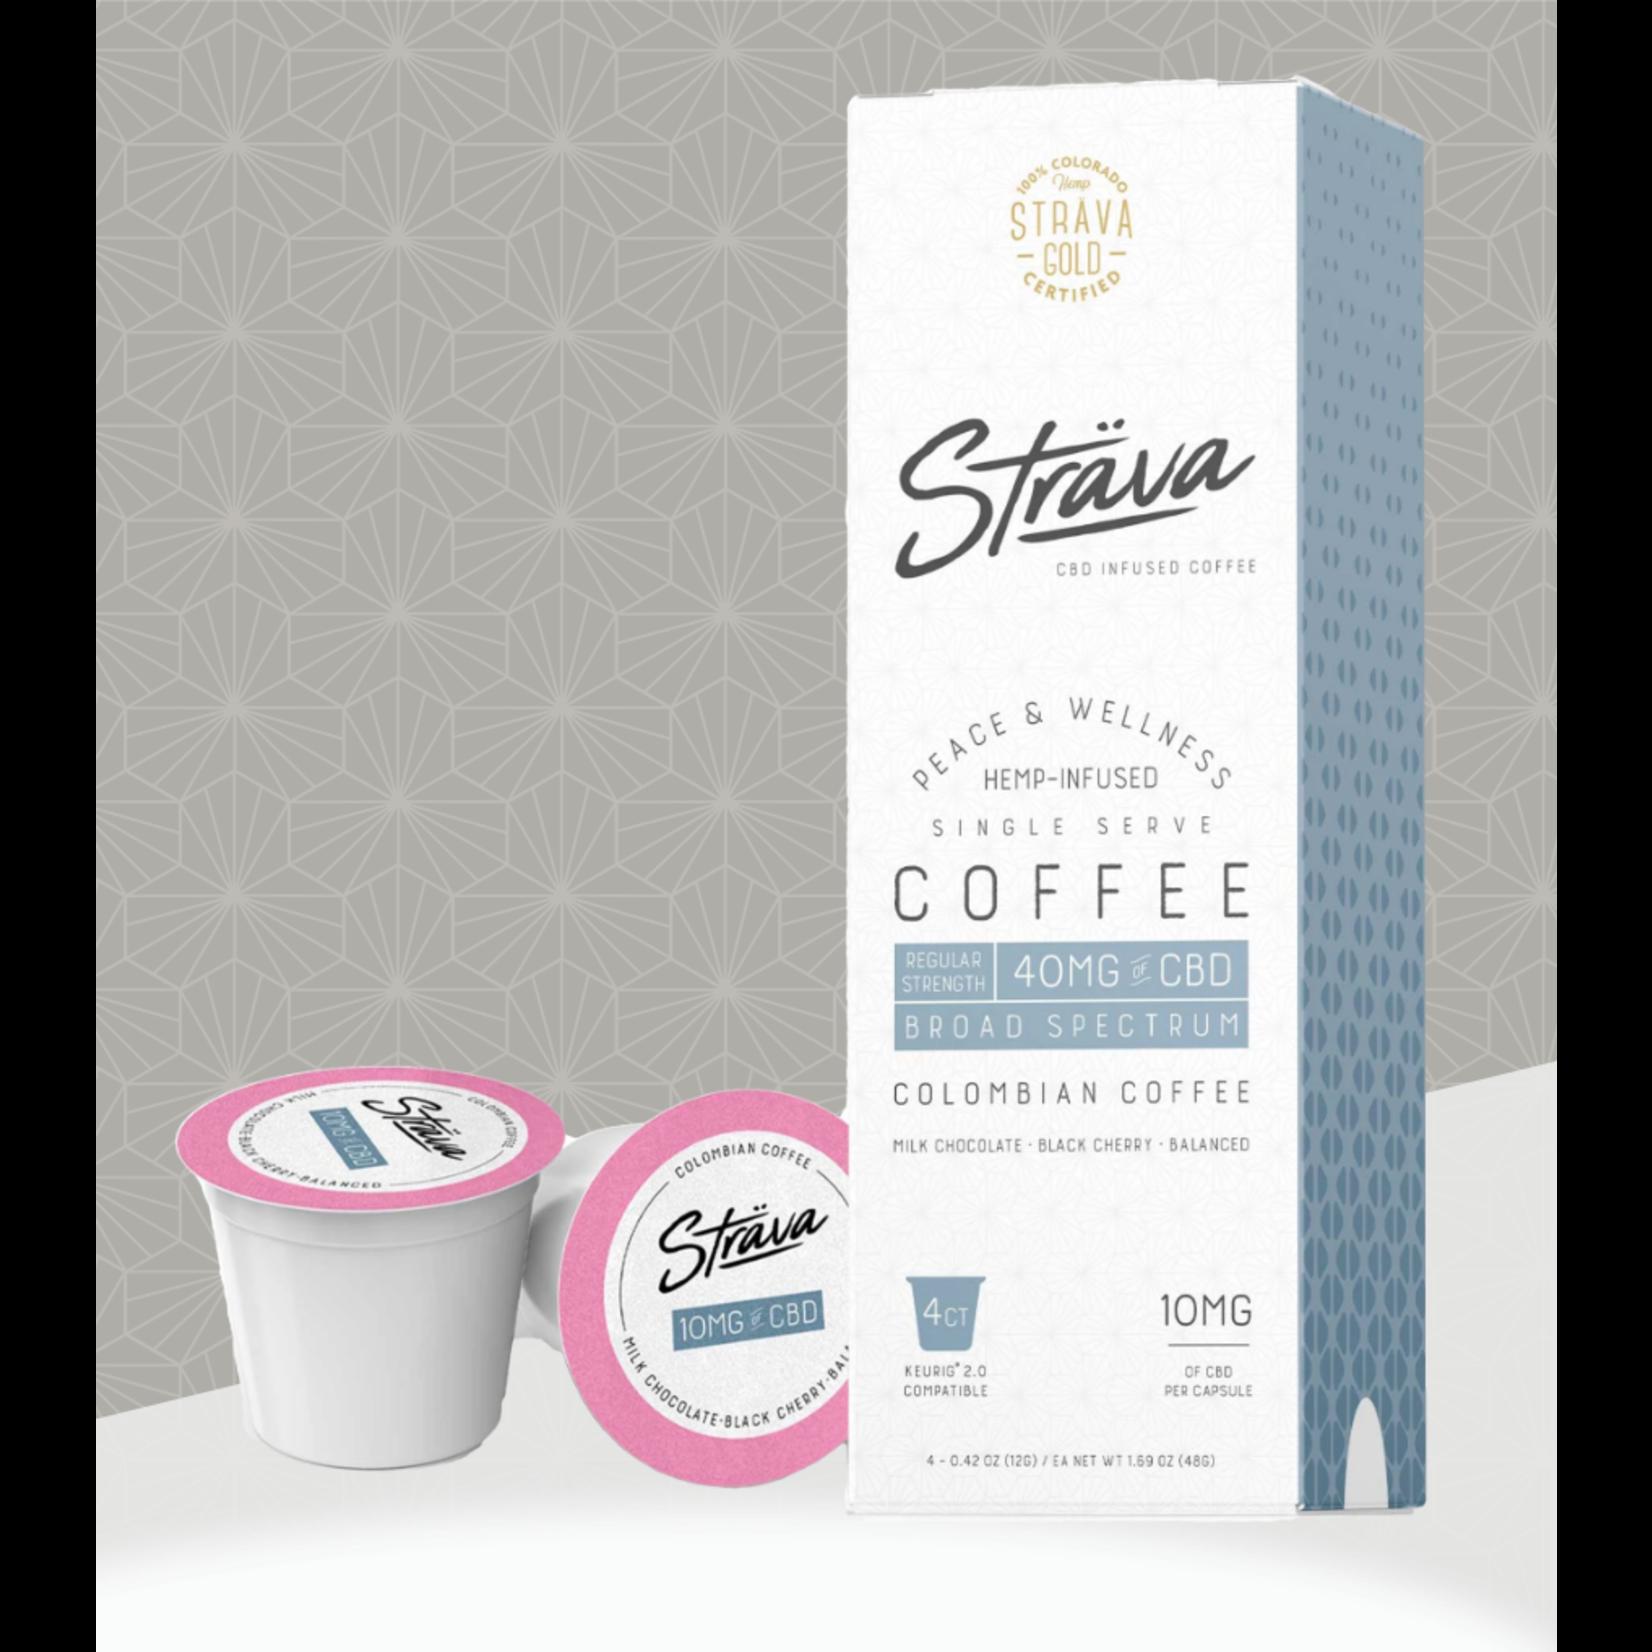 Strava Strava CBD Infused Coffee 40mg Broad Spectrum  Single Serve Keurig cup Regular Strength